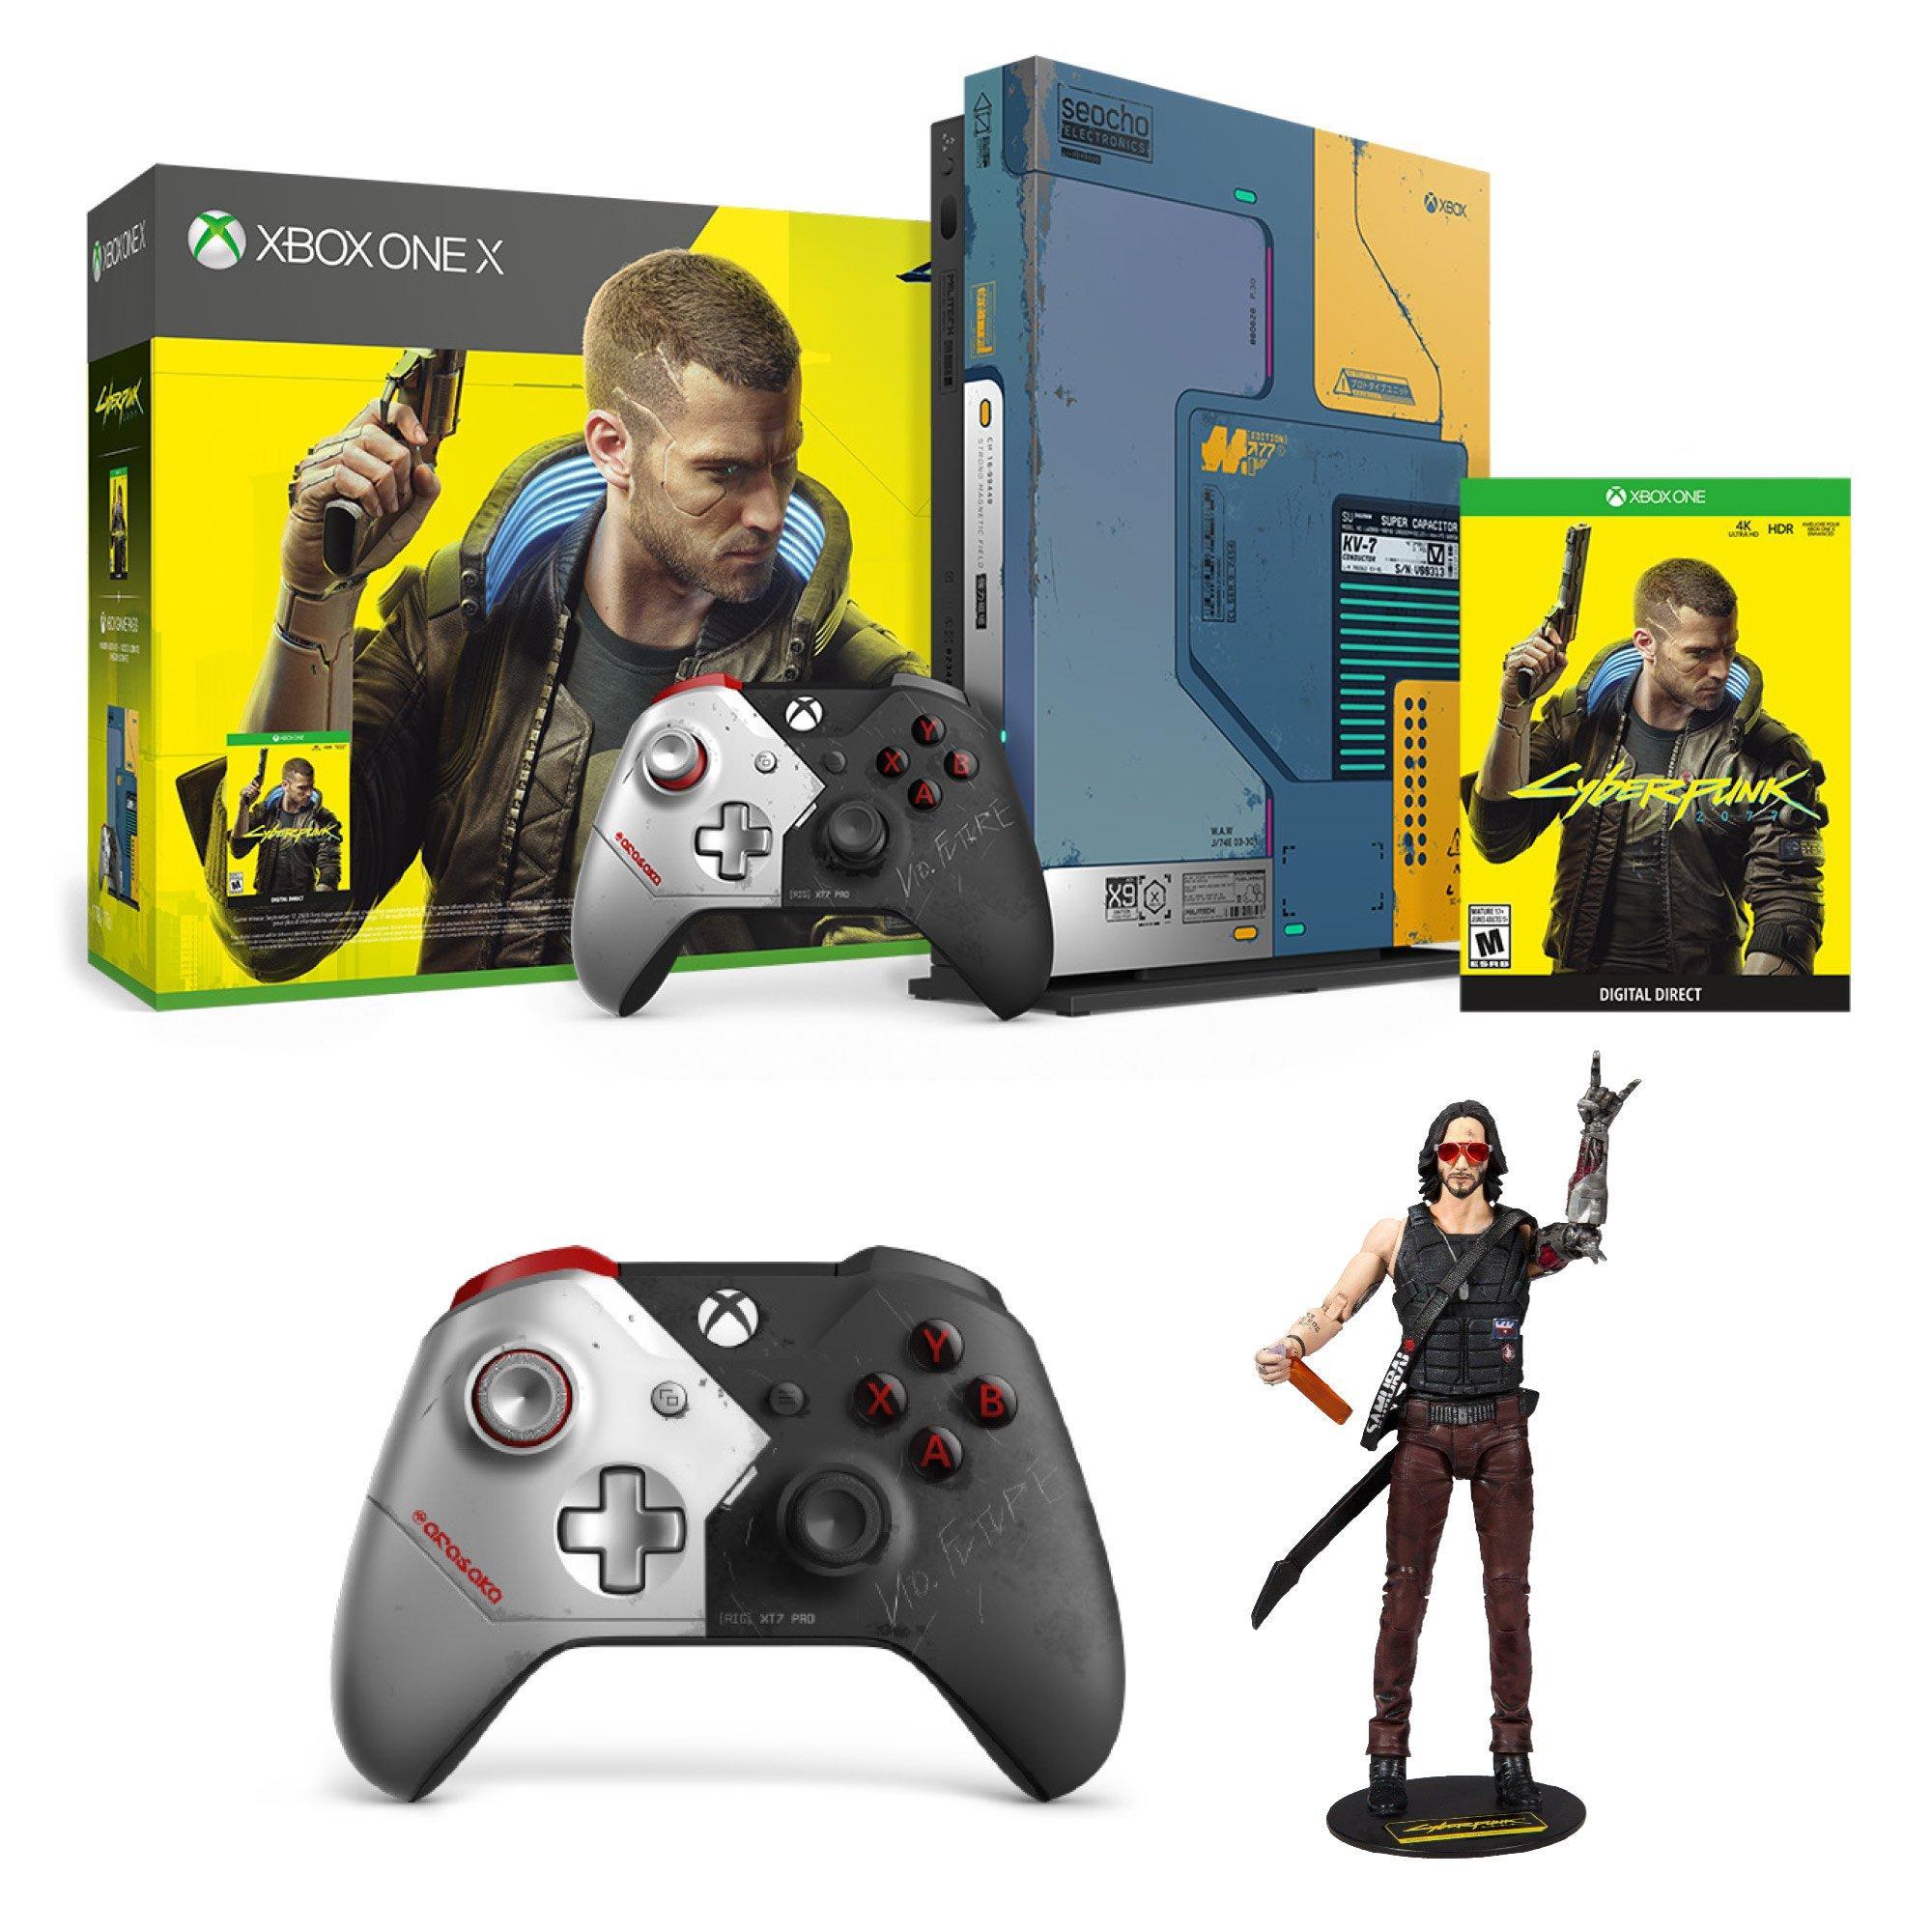 Xbox One X 1TB Cyberpunk 2077 Console + Wireless Controller + Figure